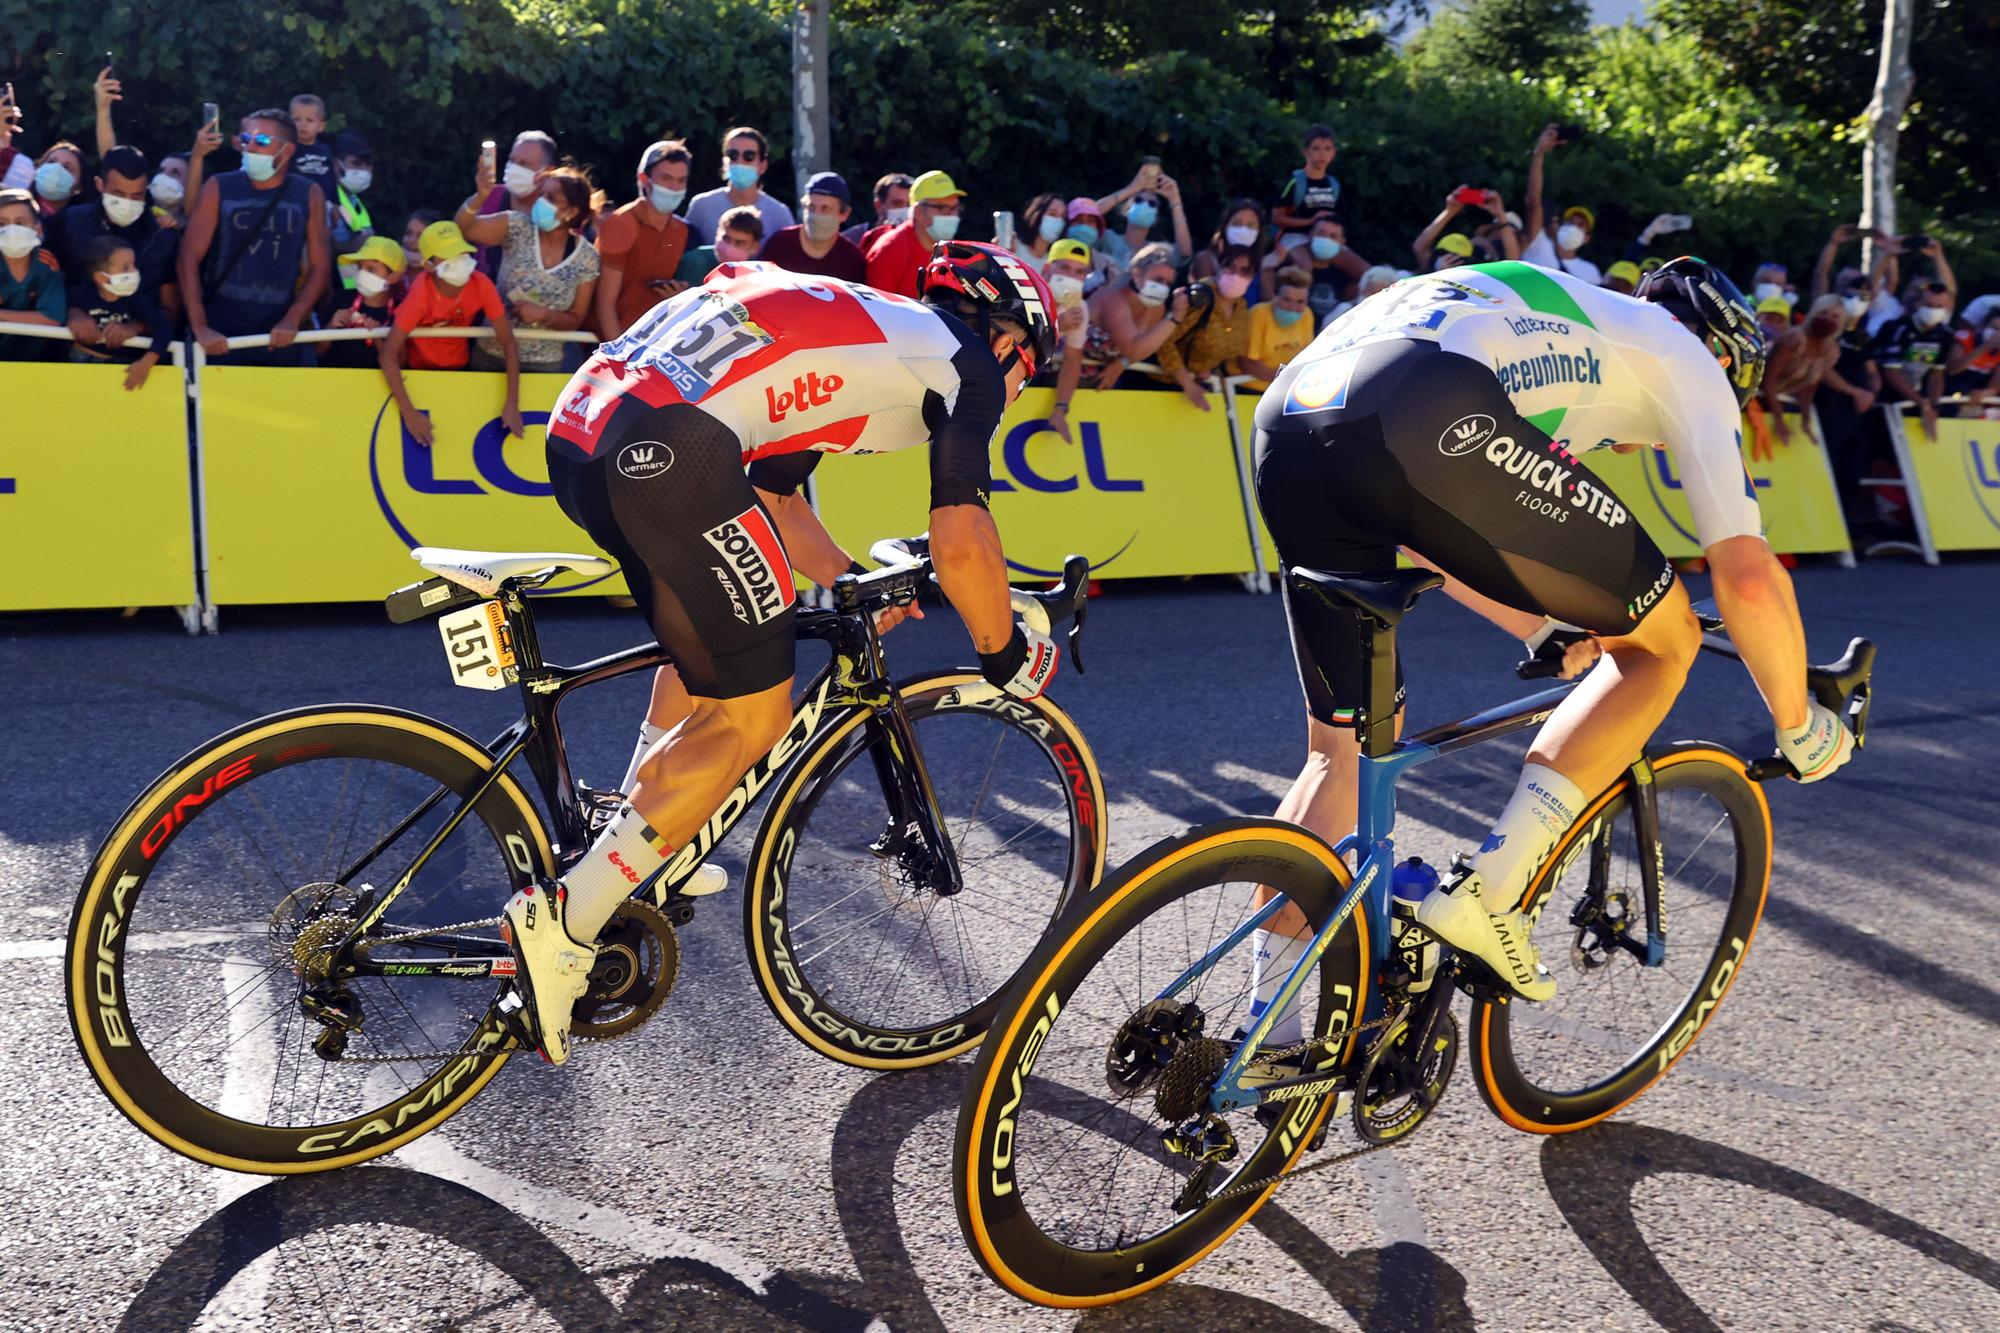 Tour de France 2020 107th Edition 3rd stage Nice Sisteron 198 km 31082020 Caleb Ewan AUS Lotto Soudal Sam Bennett IRL Deceuninck Quick Step photo Kei TsujiBettiniPhoto2020